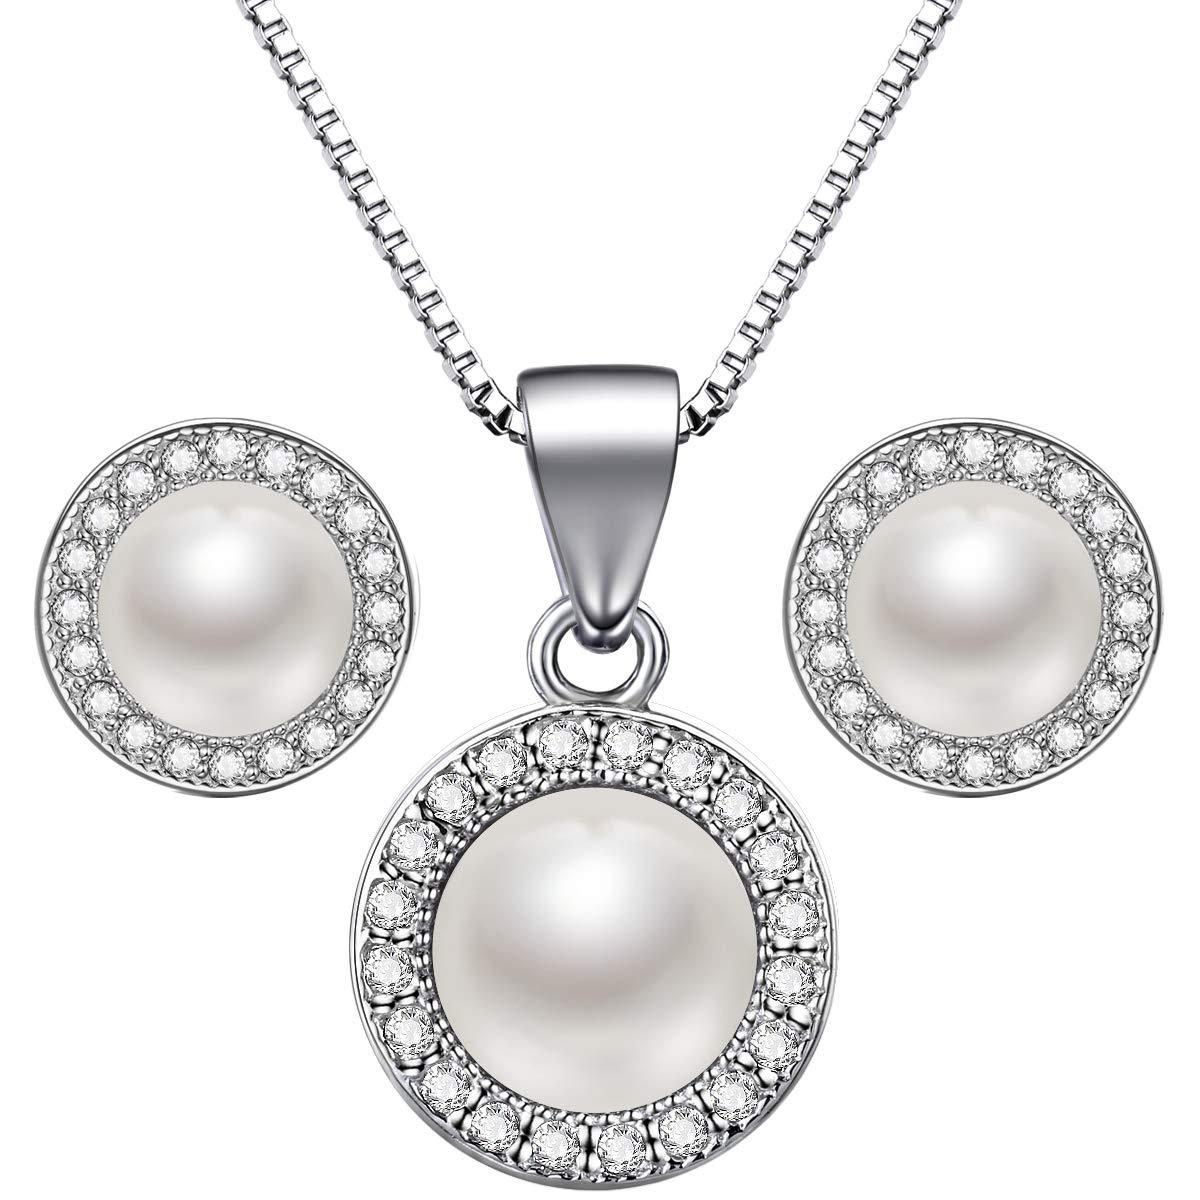 c4d249fa8 Lydreewam Pearl Necklace Earrings Jewellery Set 925 Sterling Silver  Valentine Gift Box for Women/Girls: Amazon.co.uk: Jewellery